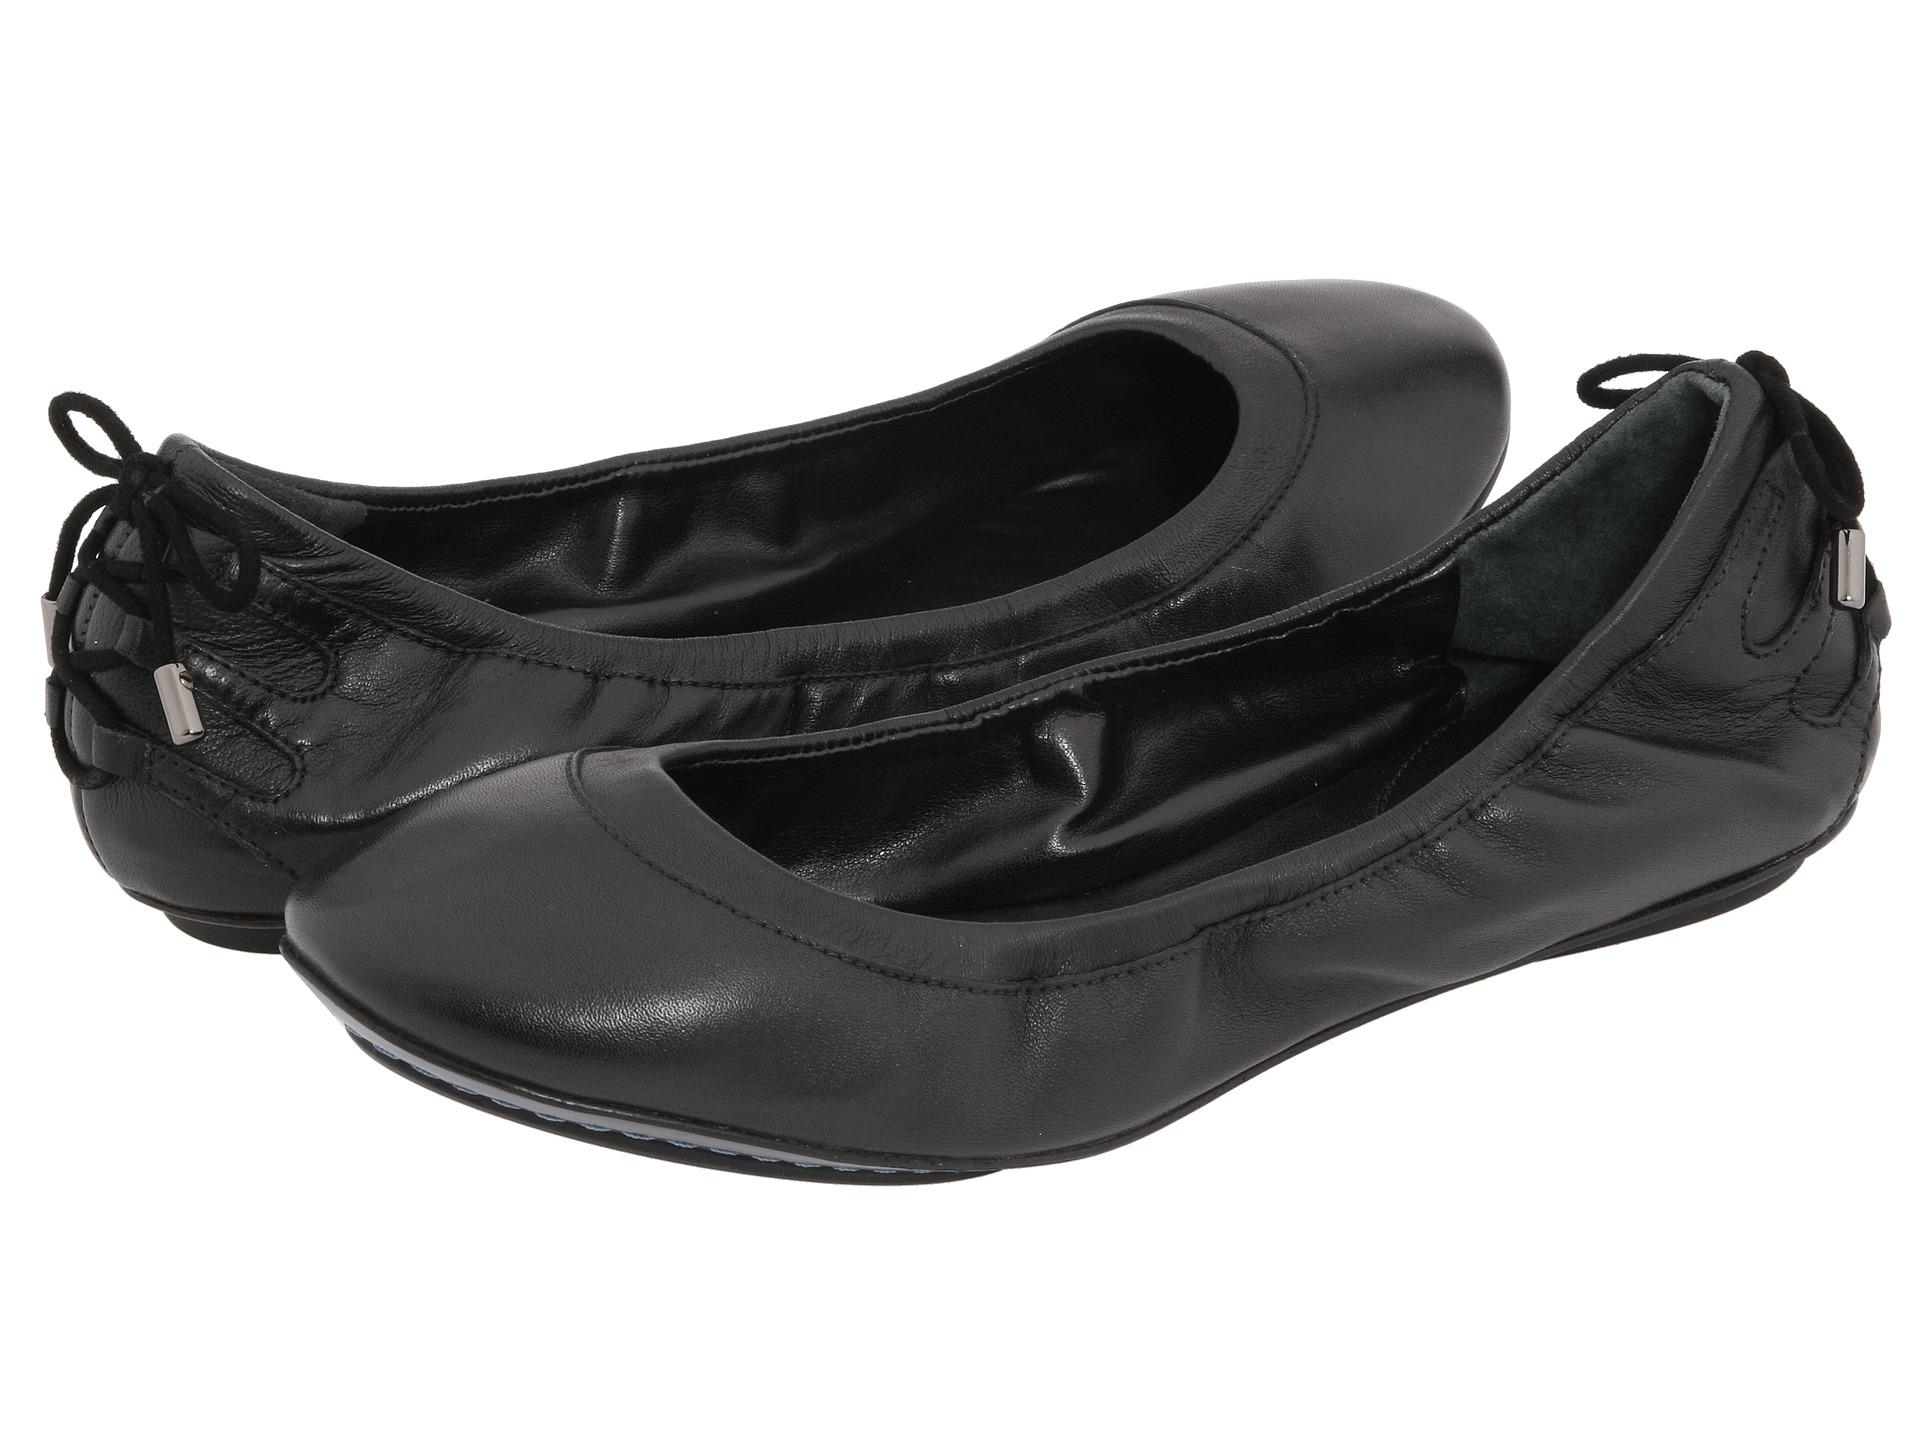 Best Sandals For Plantar Fasciitis Zappos Flats